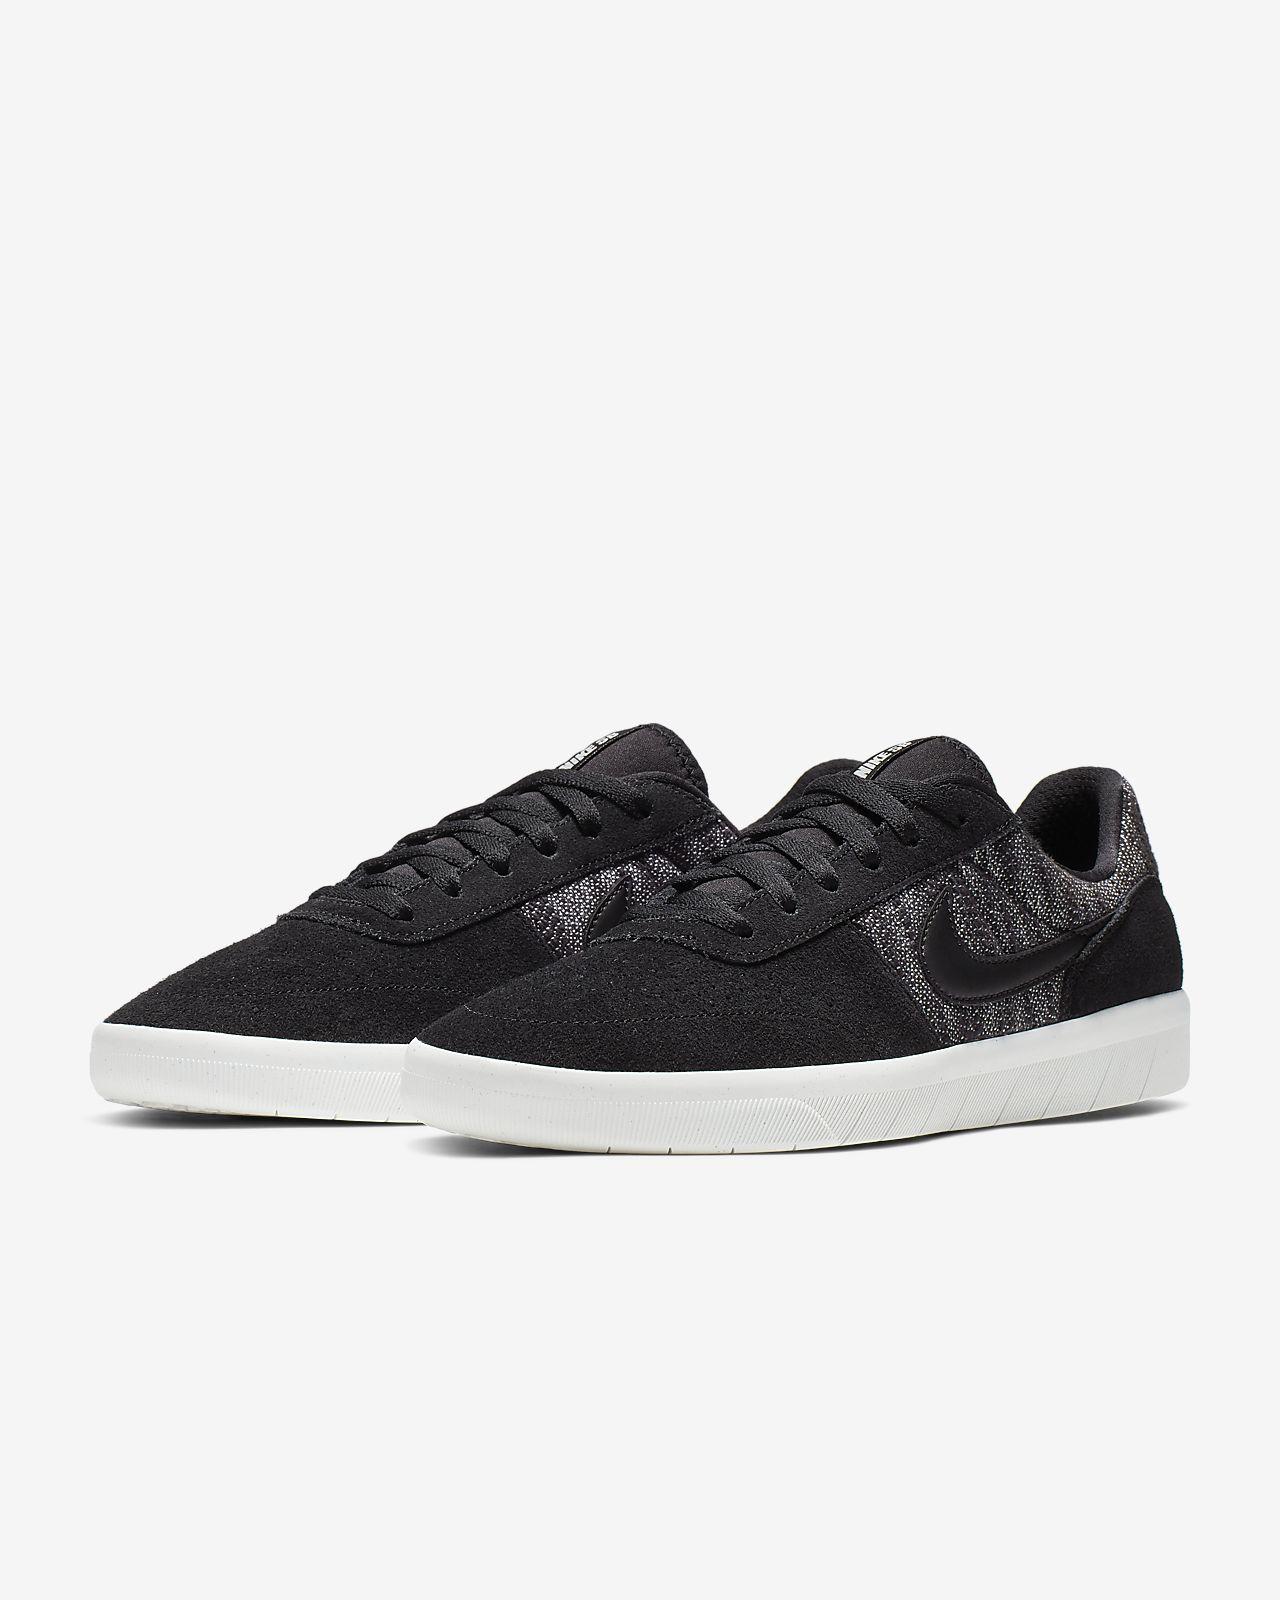 Nike SB Team Classic Premium Skate Shoe